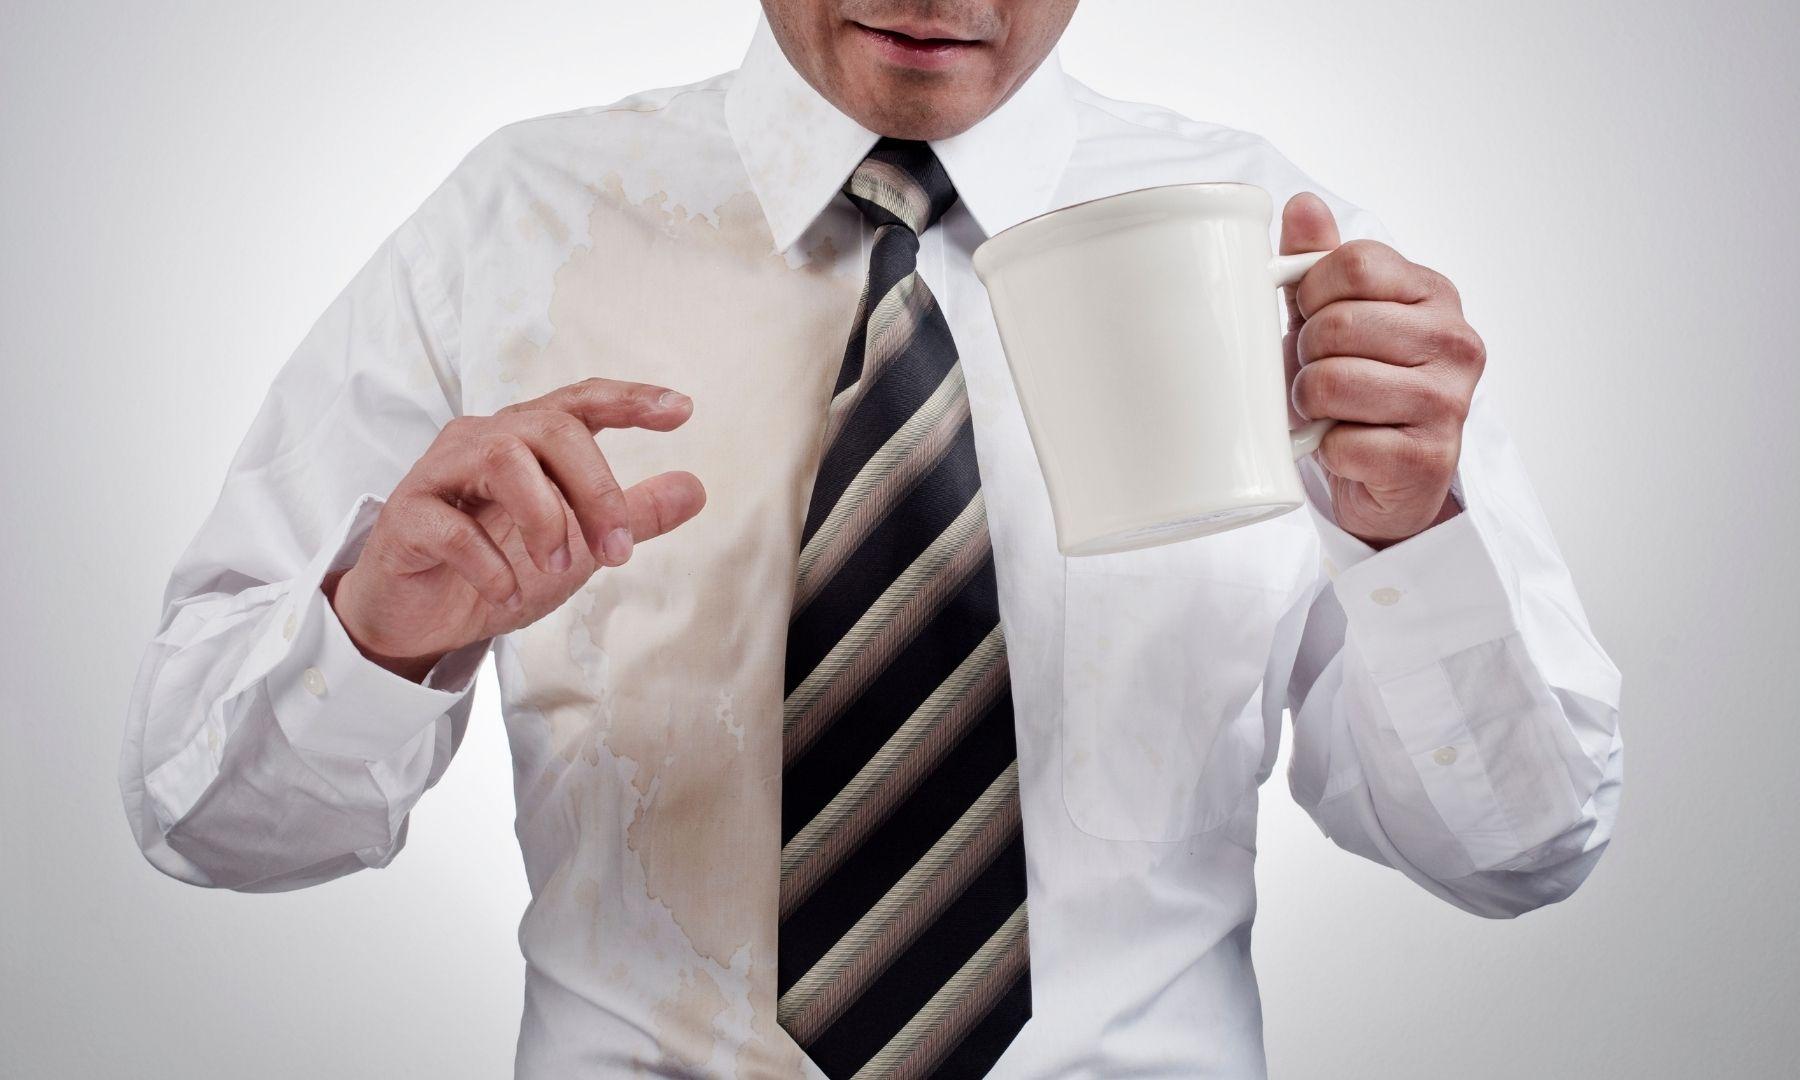 Consejos para quitar las manchas de café